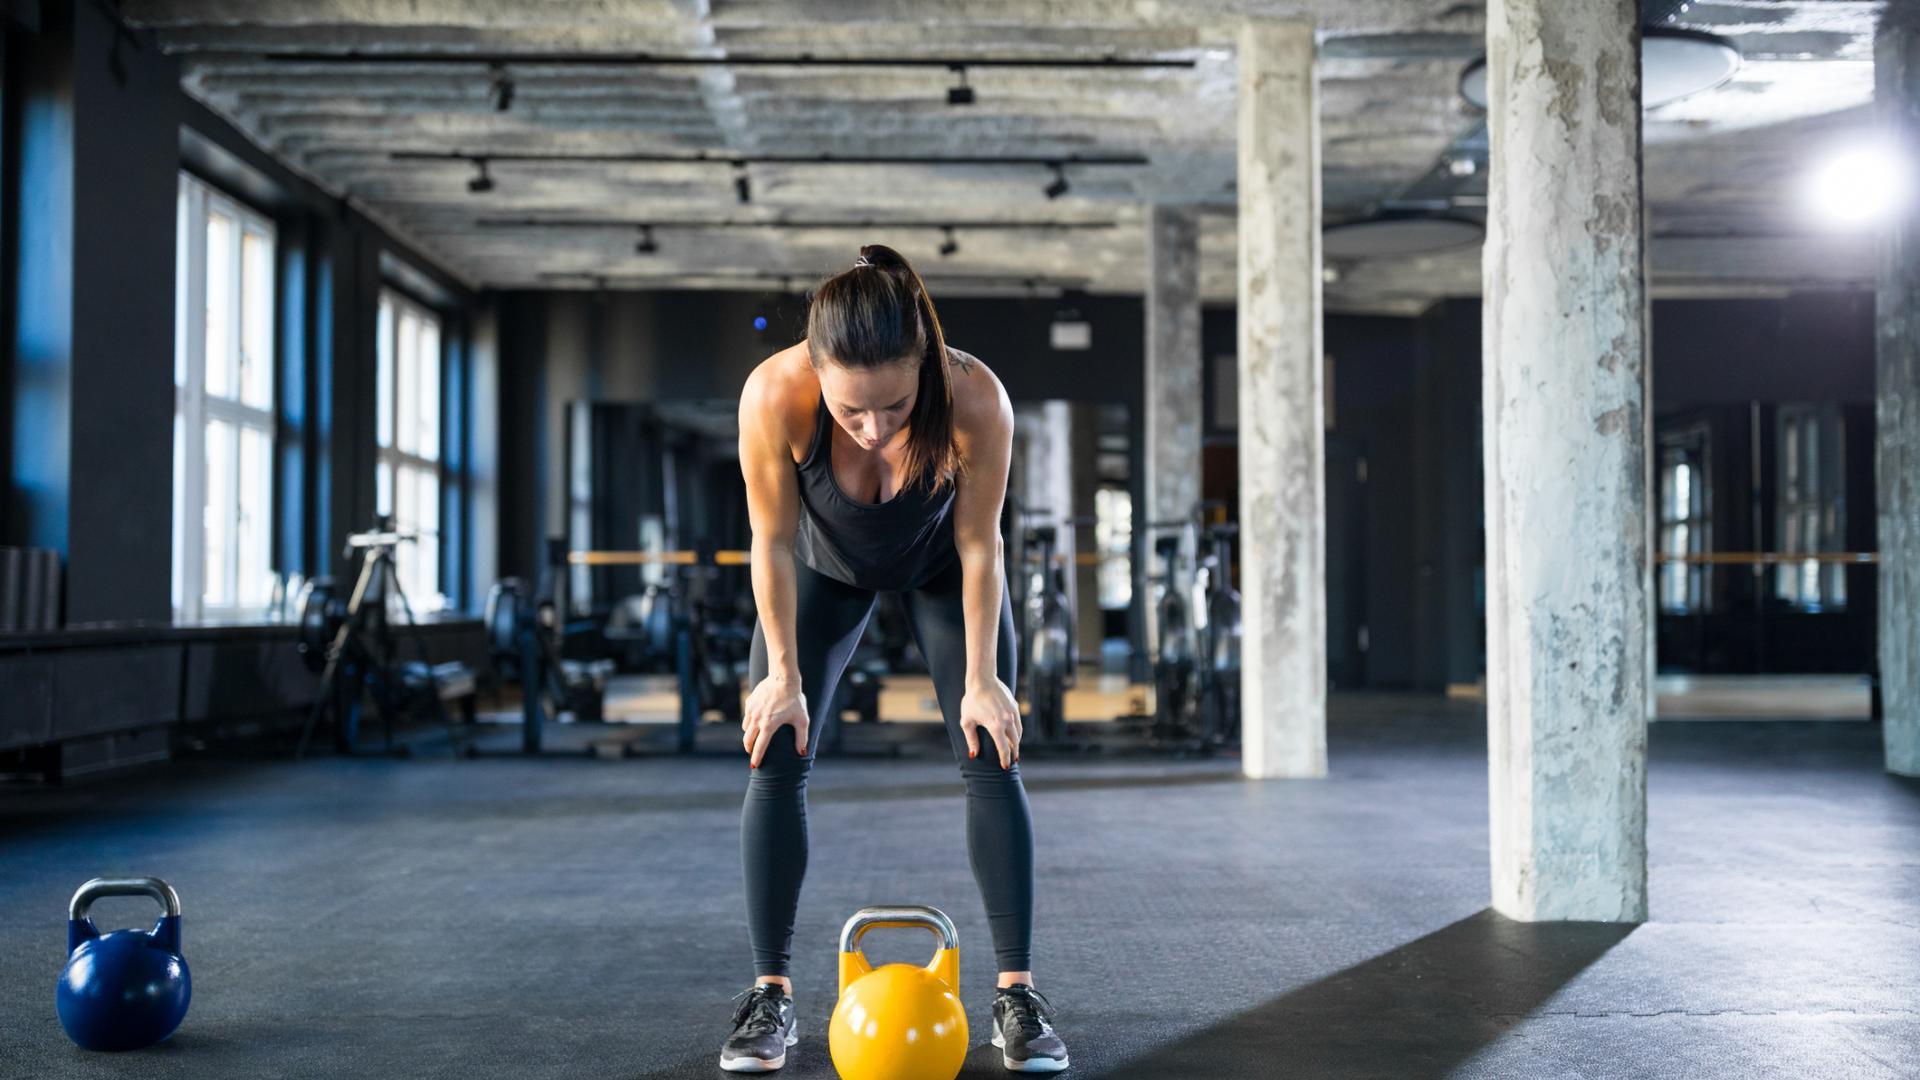 muskeln training sport kettleball fitness frau